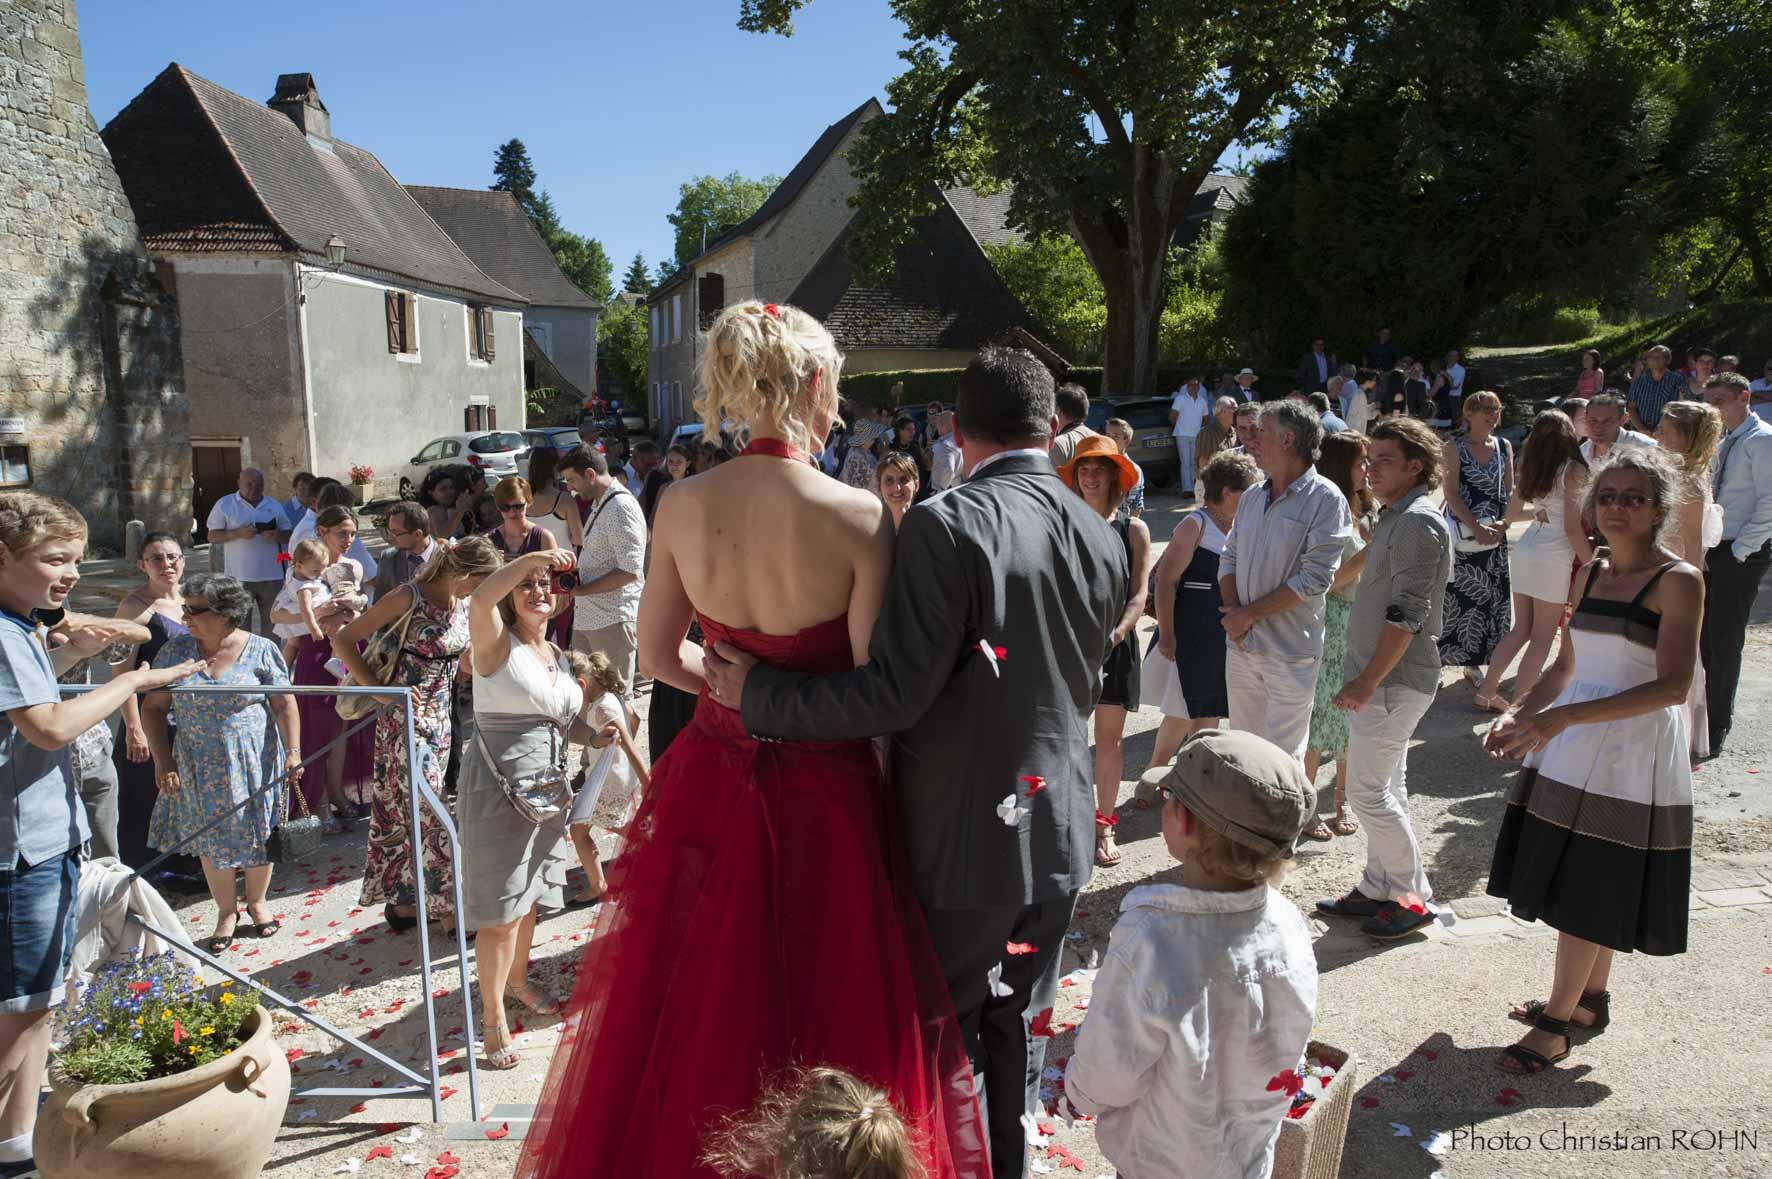 06 d700 062557 photographe mariage dordogne christian rohn - Photographe Mariage Dordogne